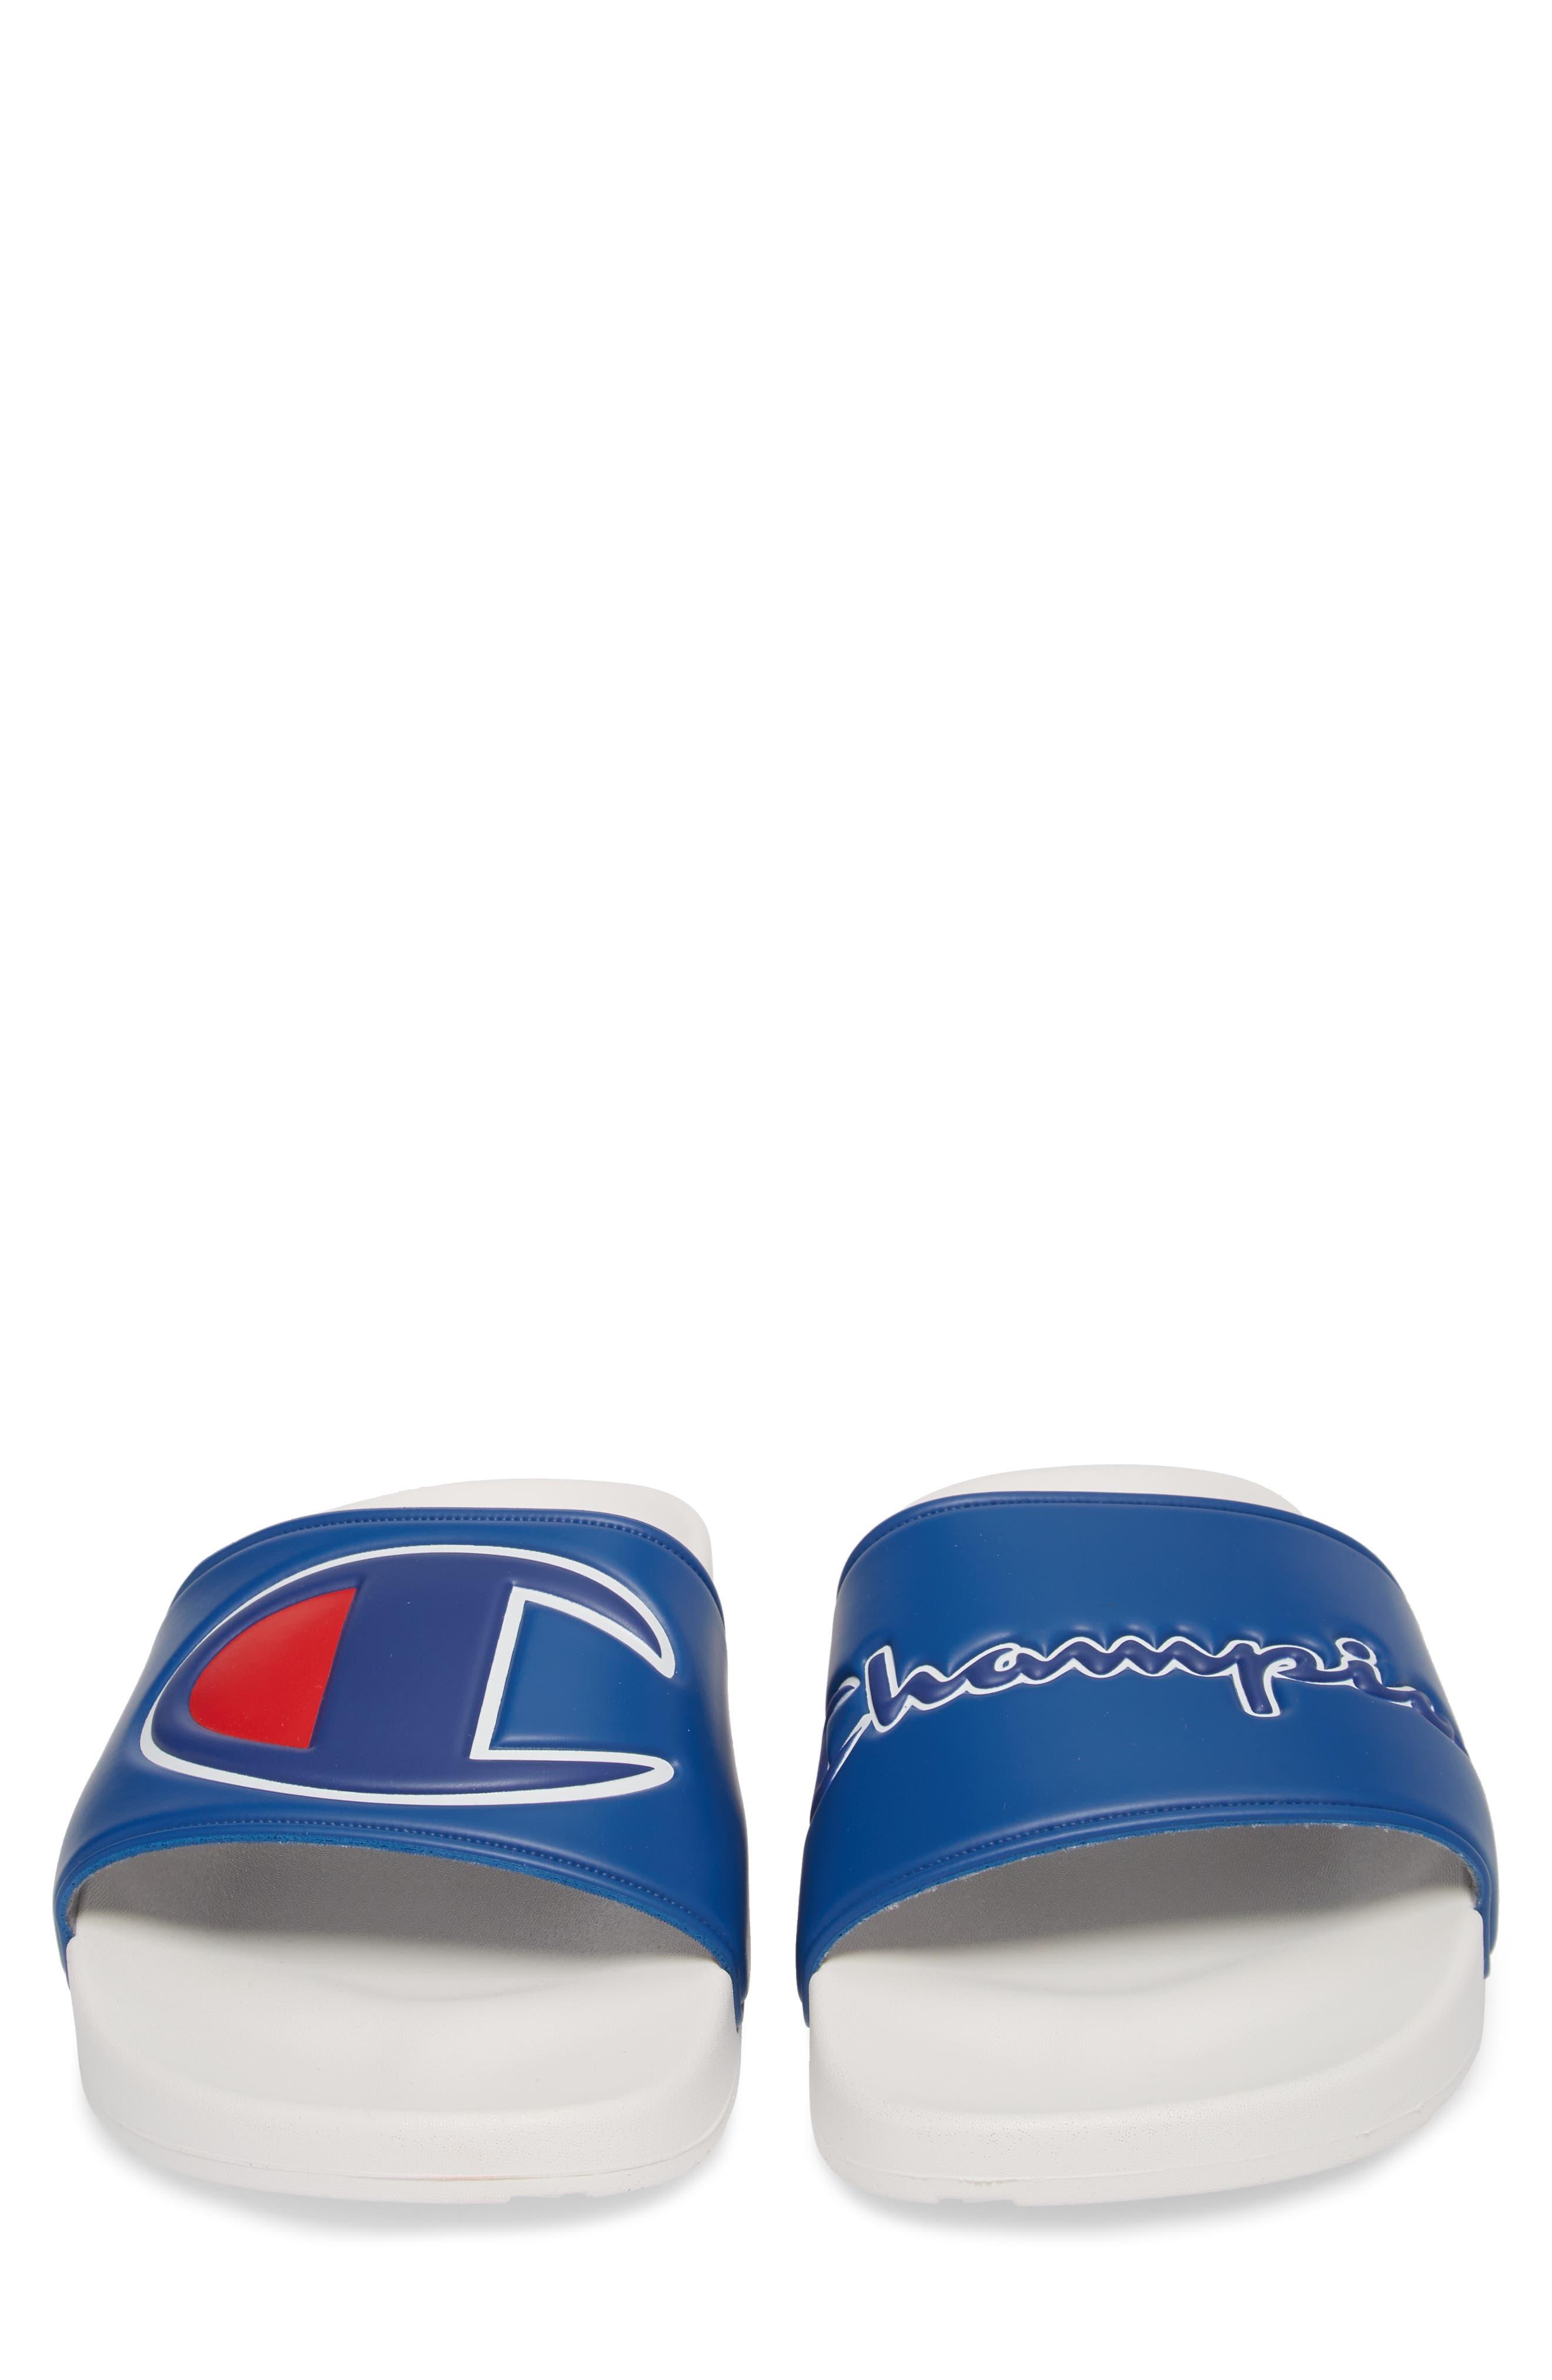 IPO Sport Slide Sandal,                             Alternate thumbnail 3, color,                             Royal